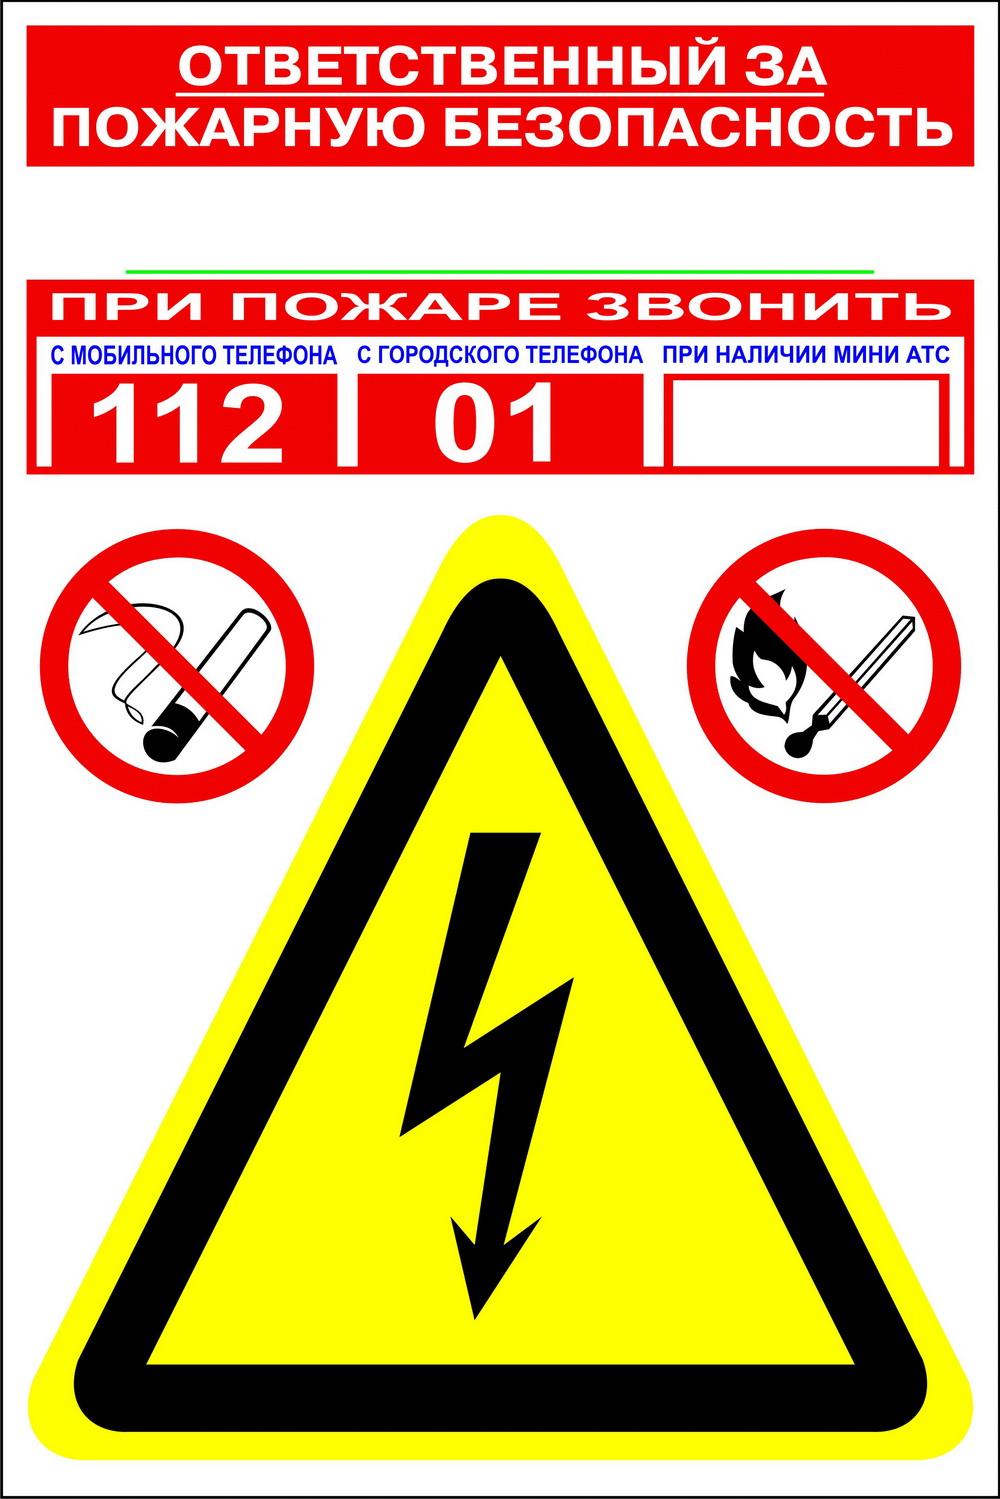 http://pozhproekt.ru/wp-content/uploads/2010/06/electro.jpg